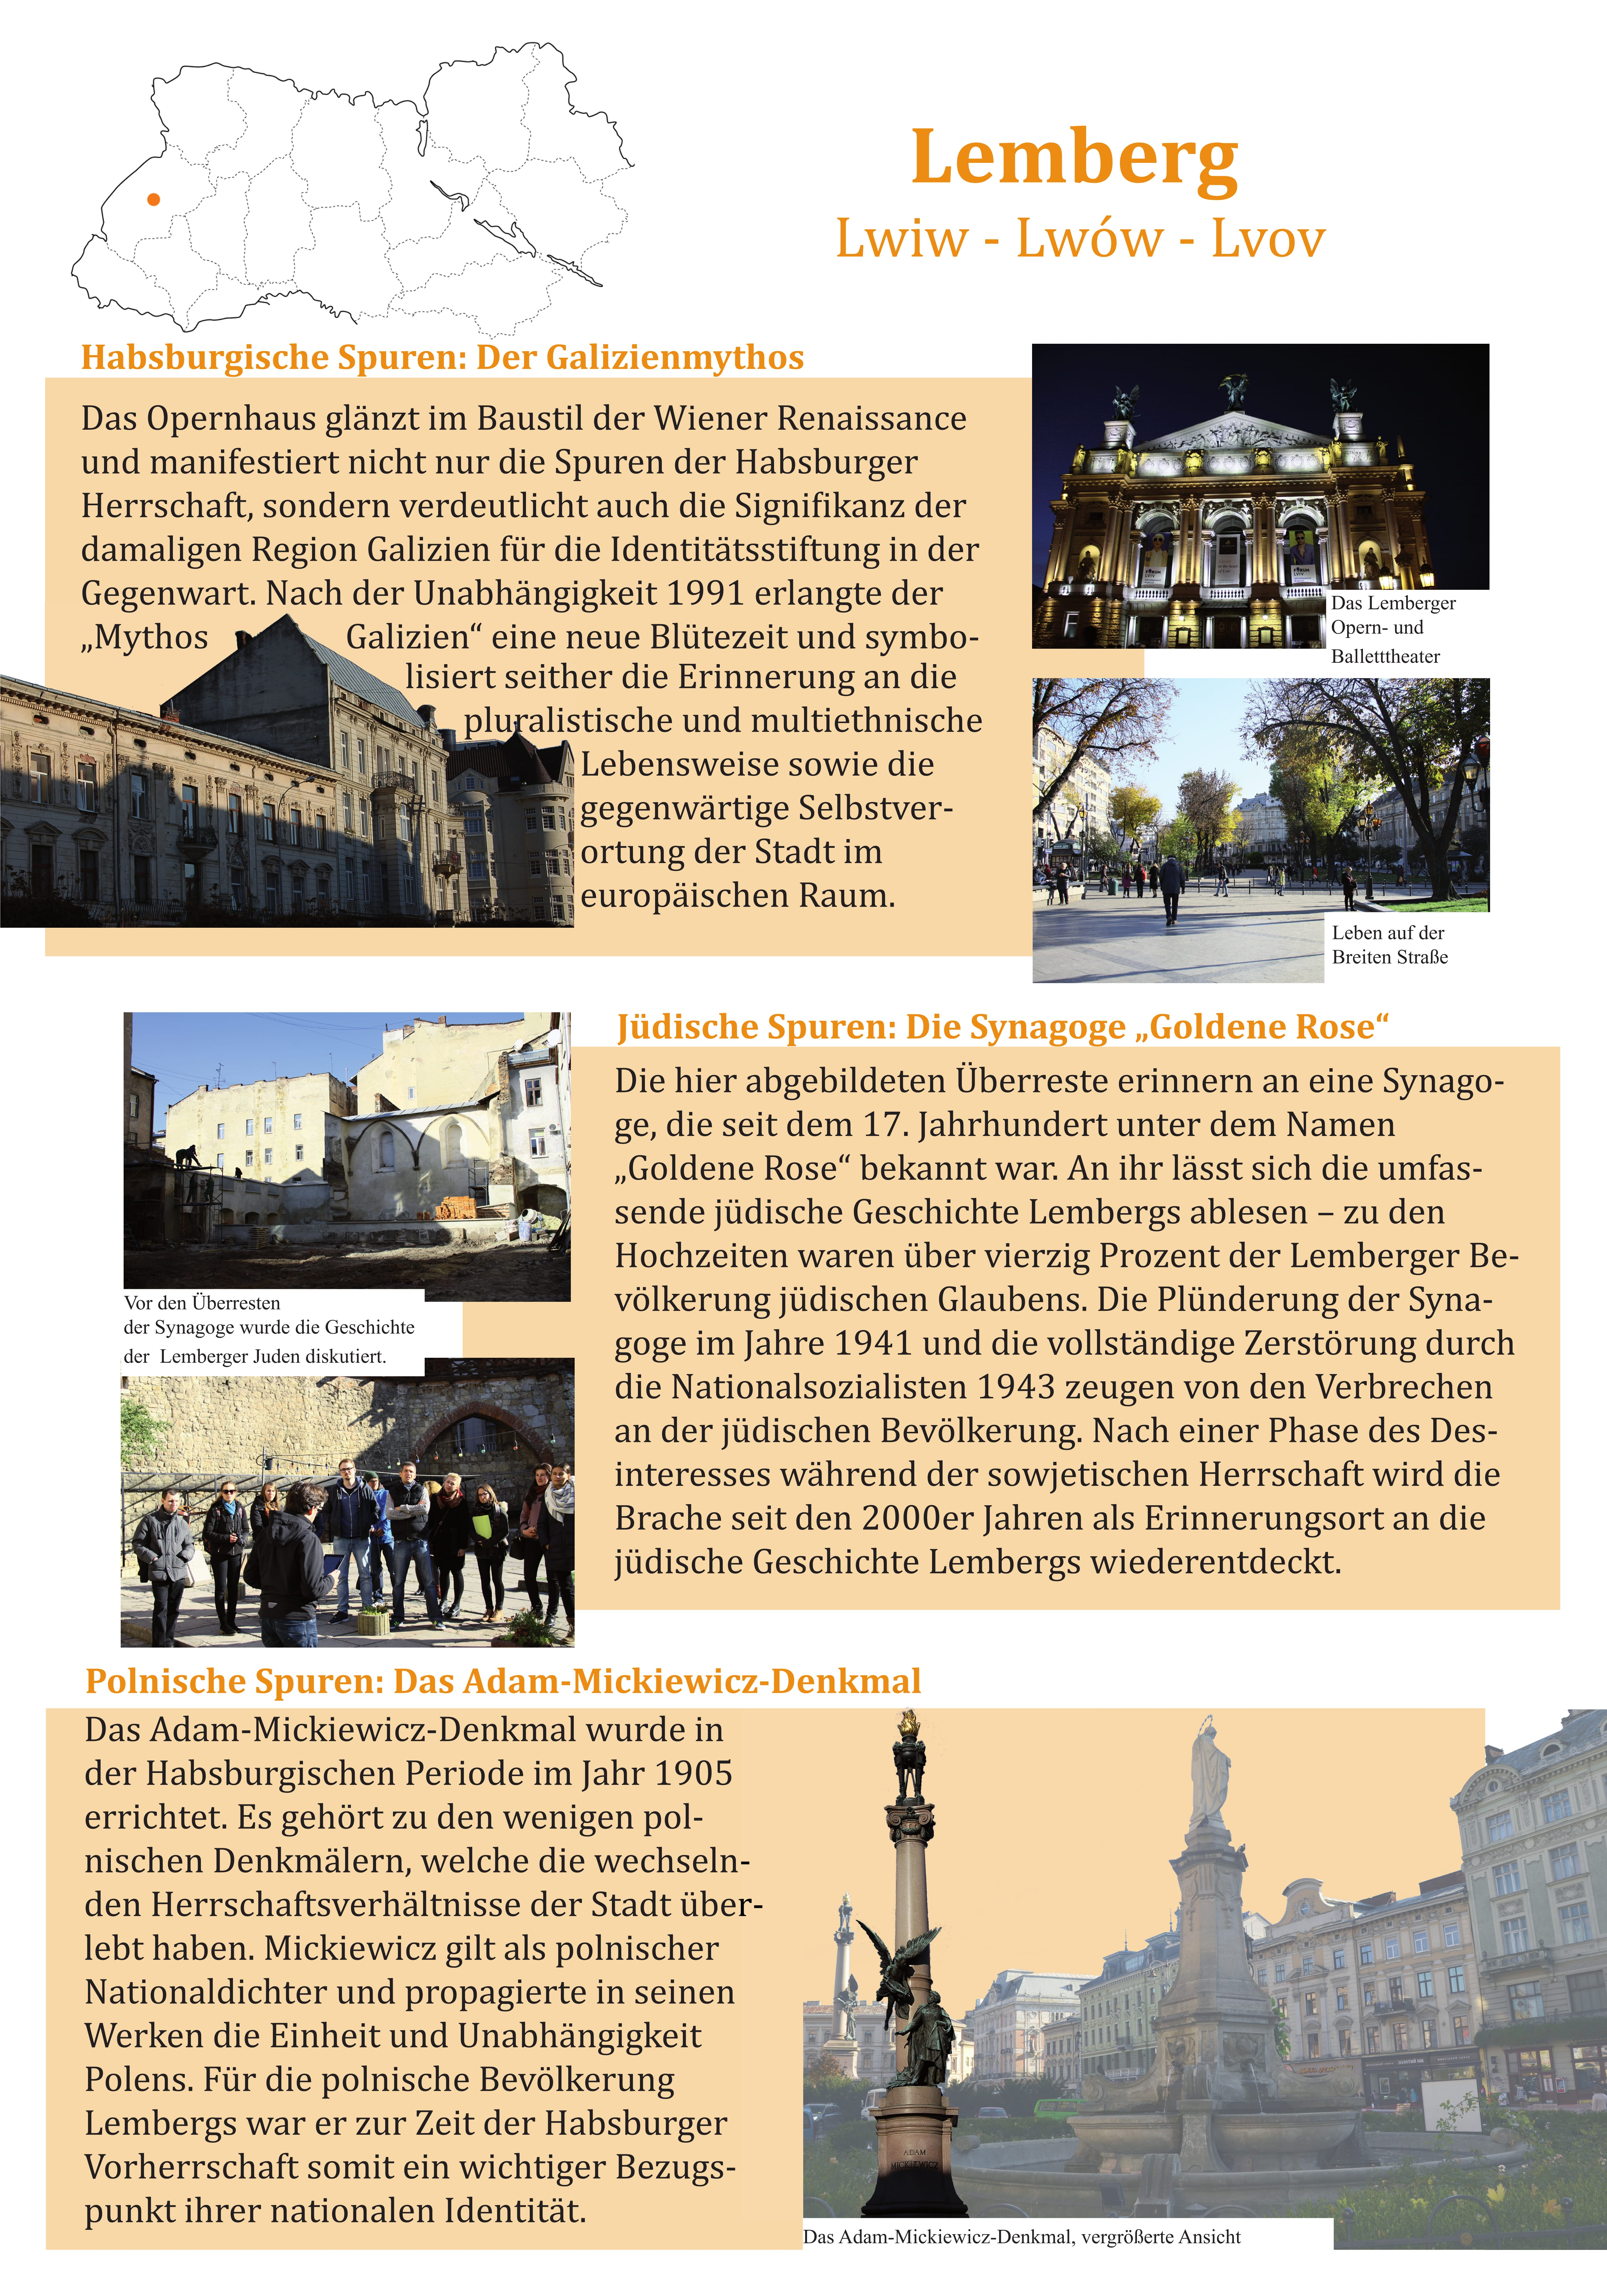 [Poster 6 und 7] Lemberg-1